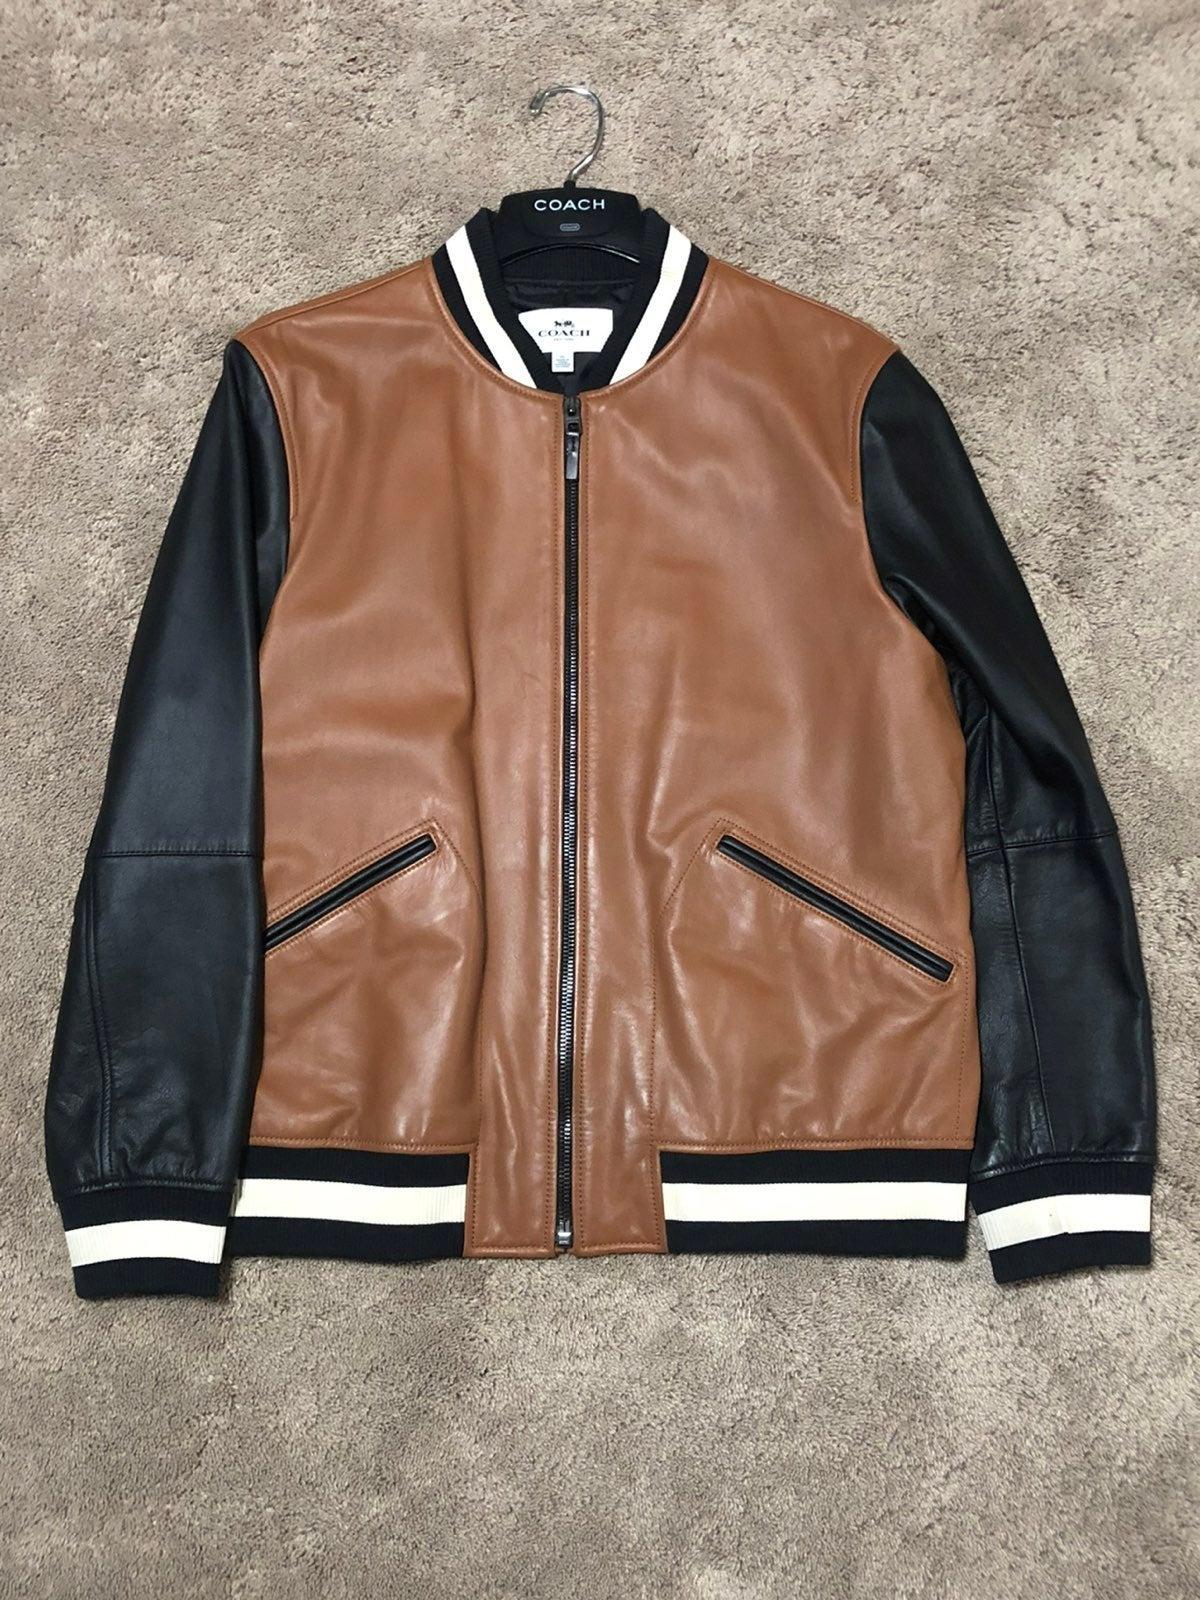 Genuine Coach Letterman Bomber Jacket